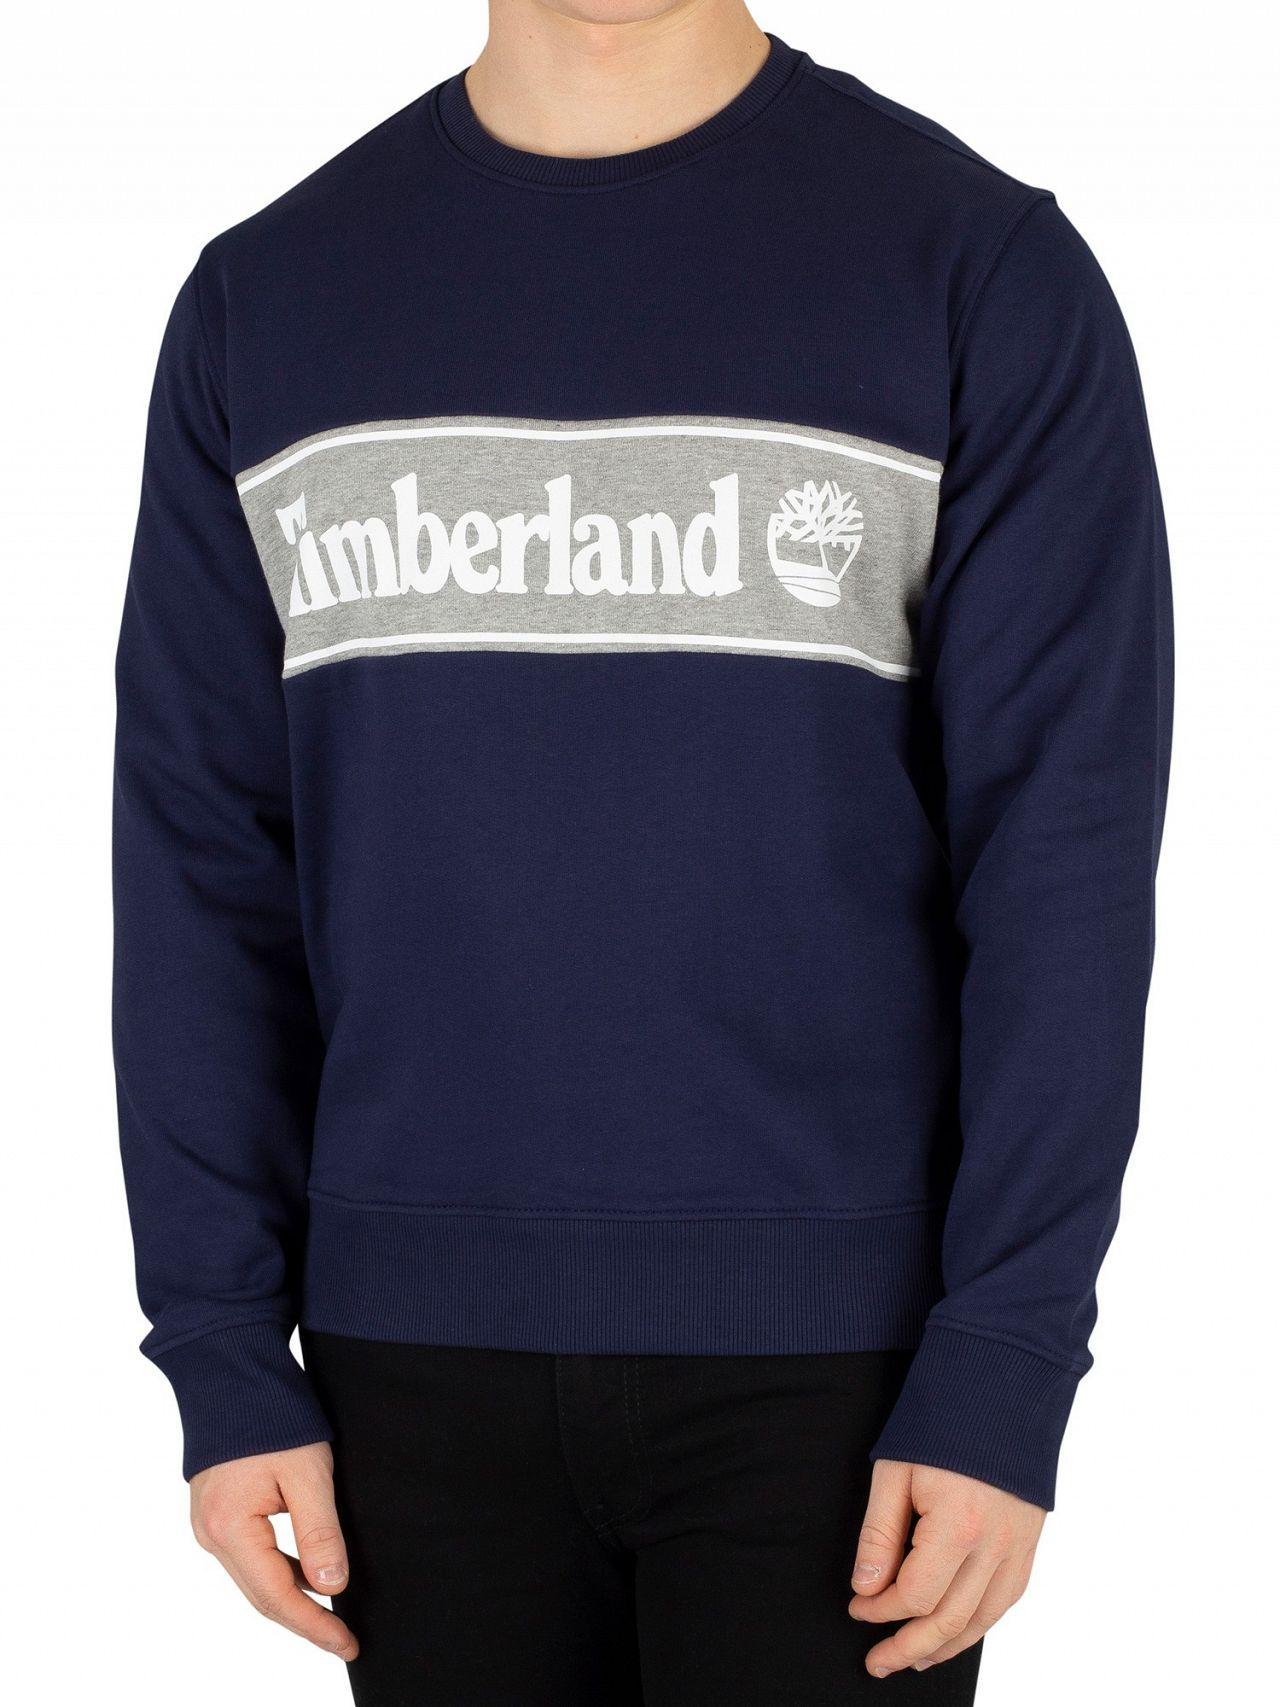 9ad594521e4 Timberland Black Iris Navy Cut   Sew Sweatshirt